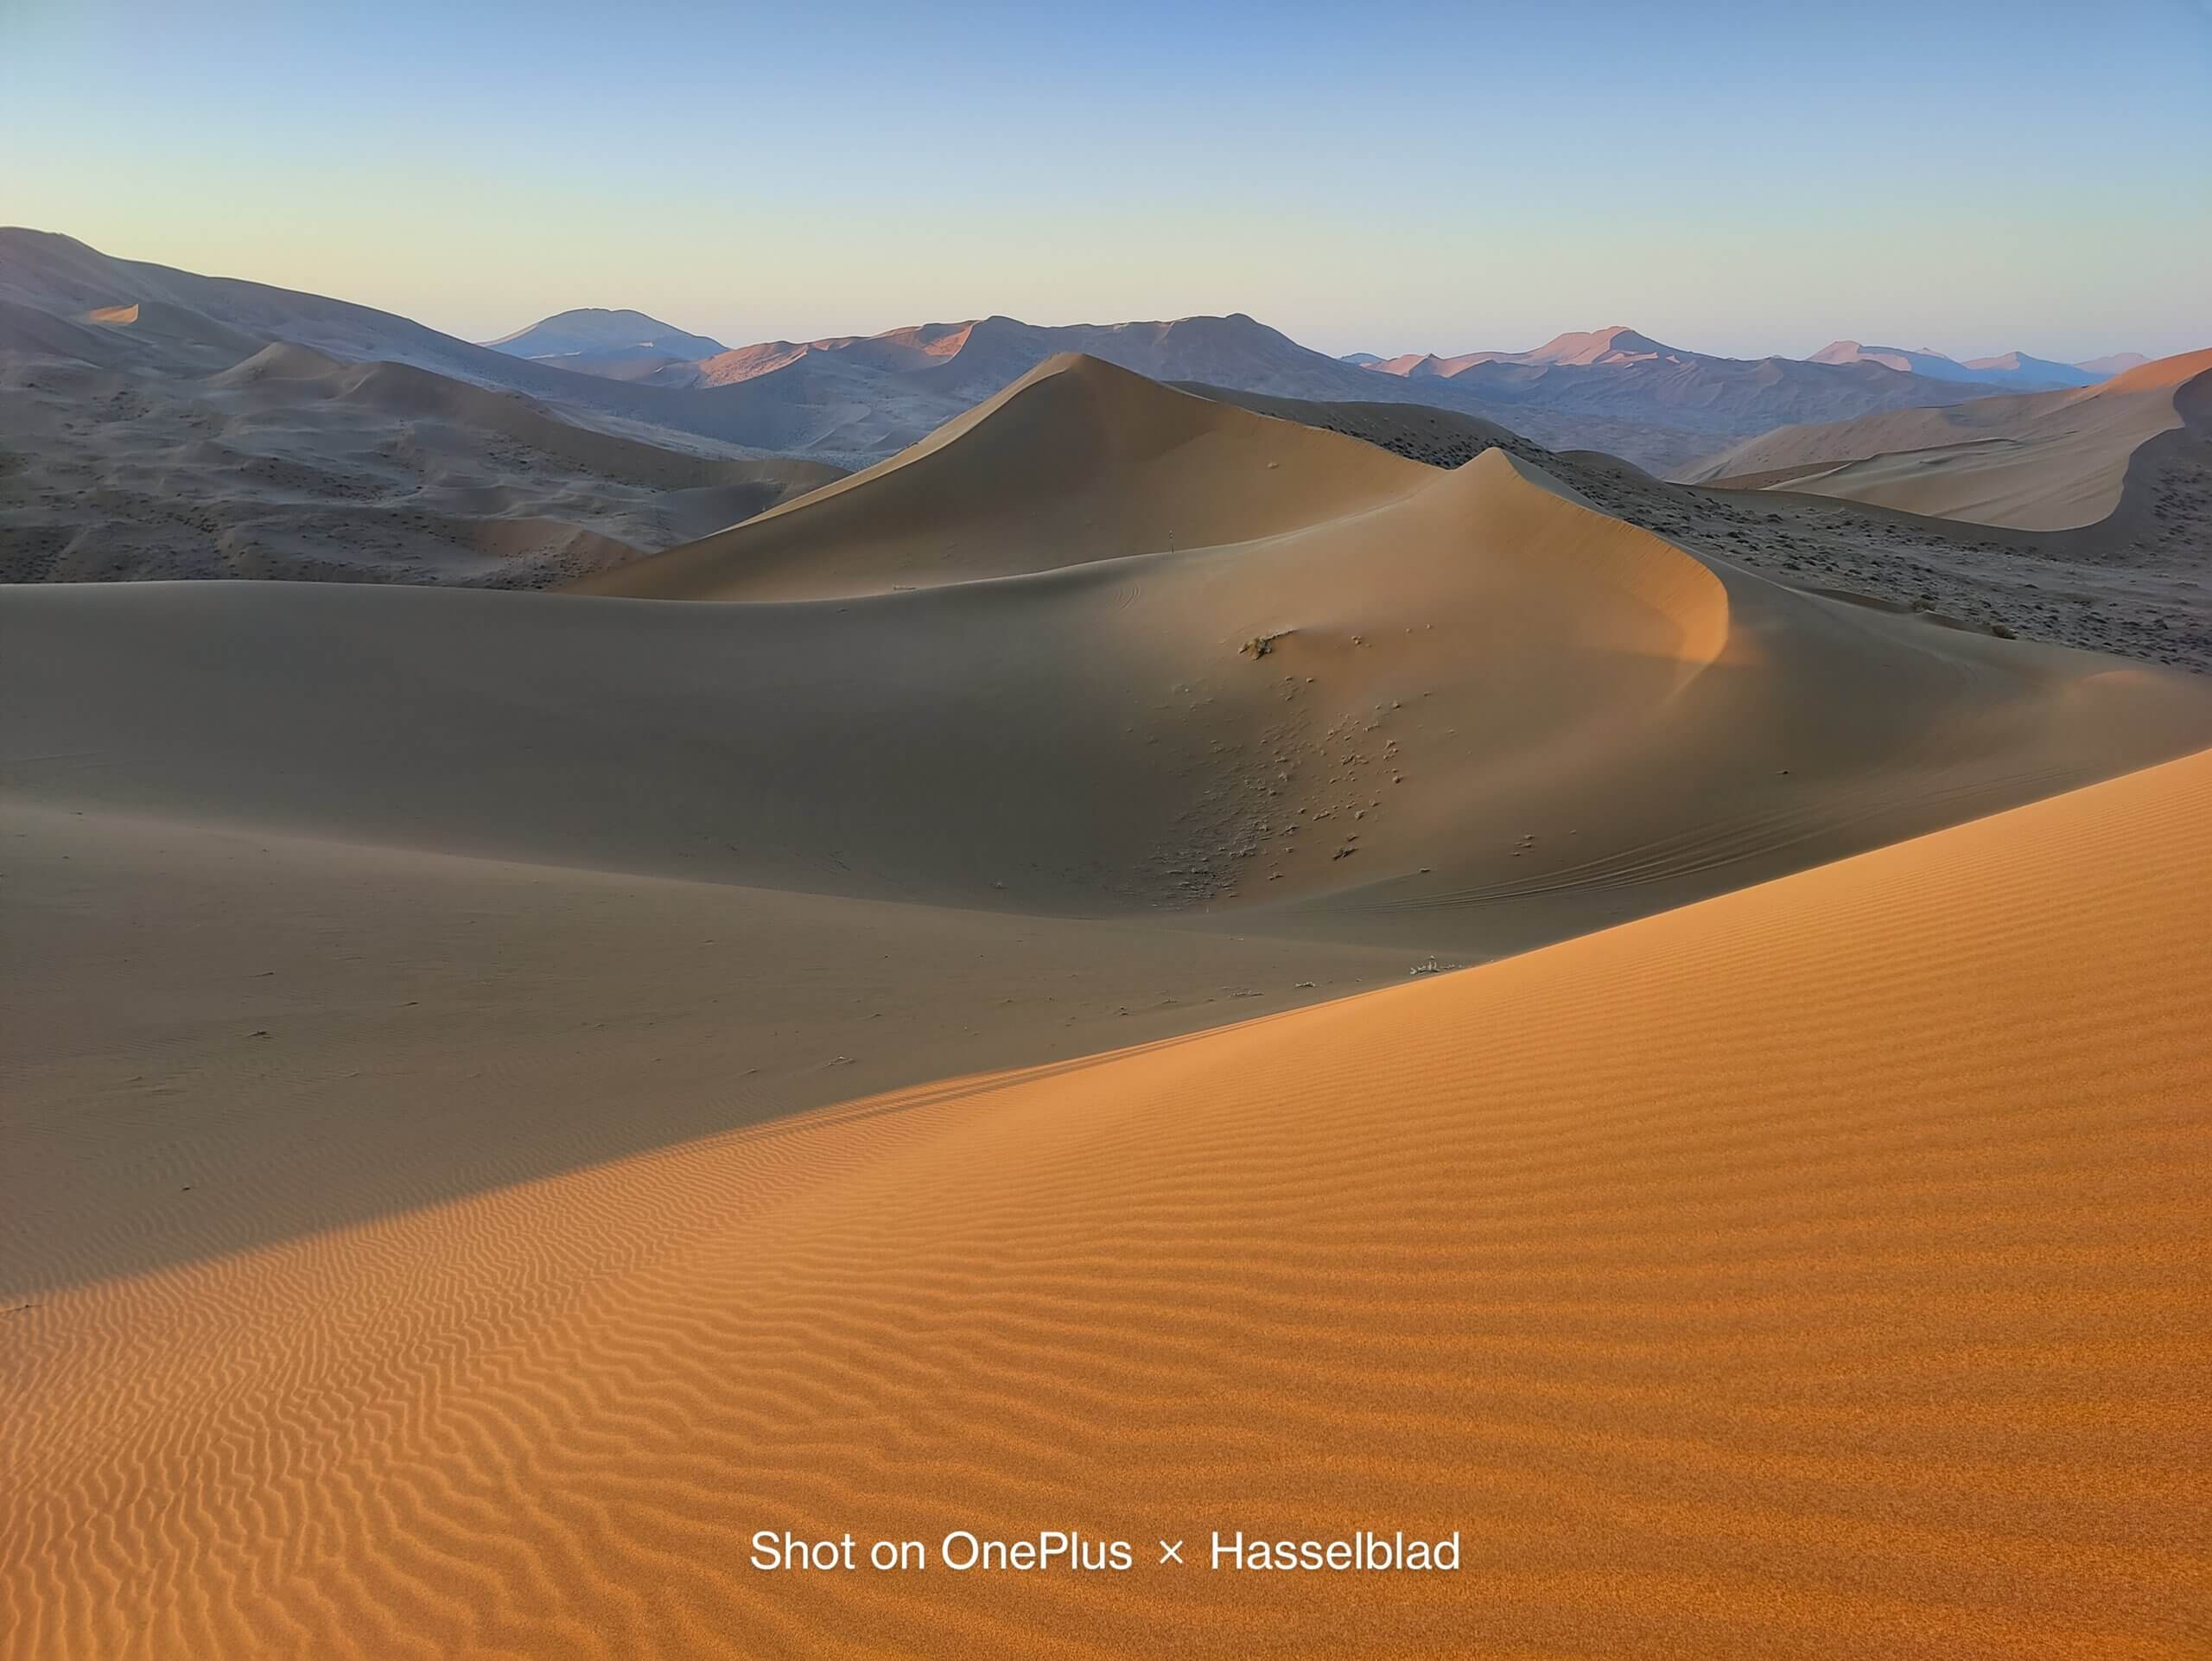 OnePlus 9シリーズで撮影した砂漠の風景